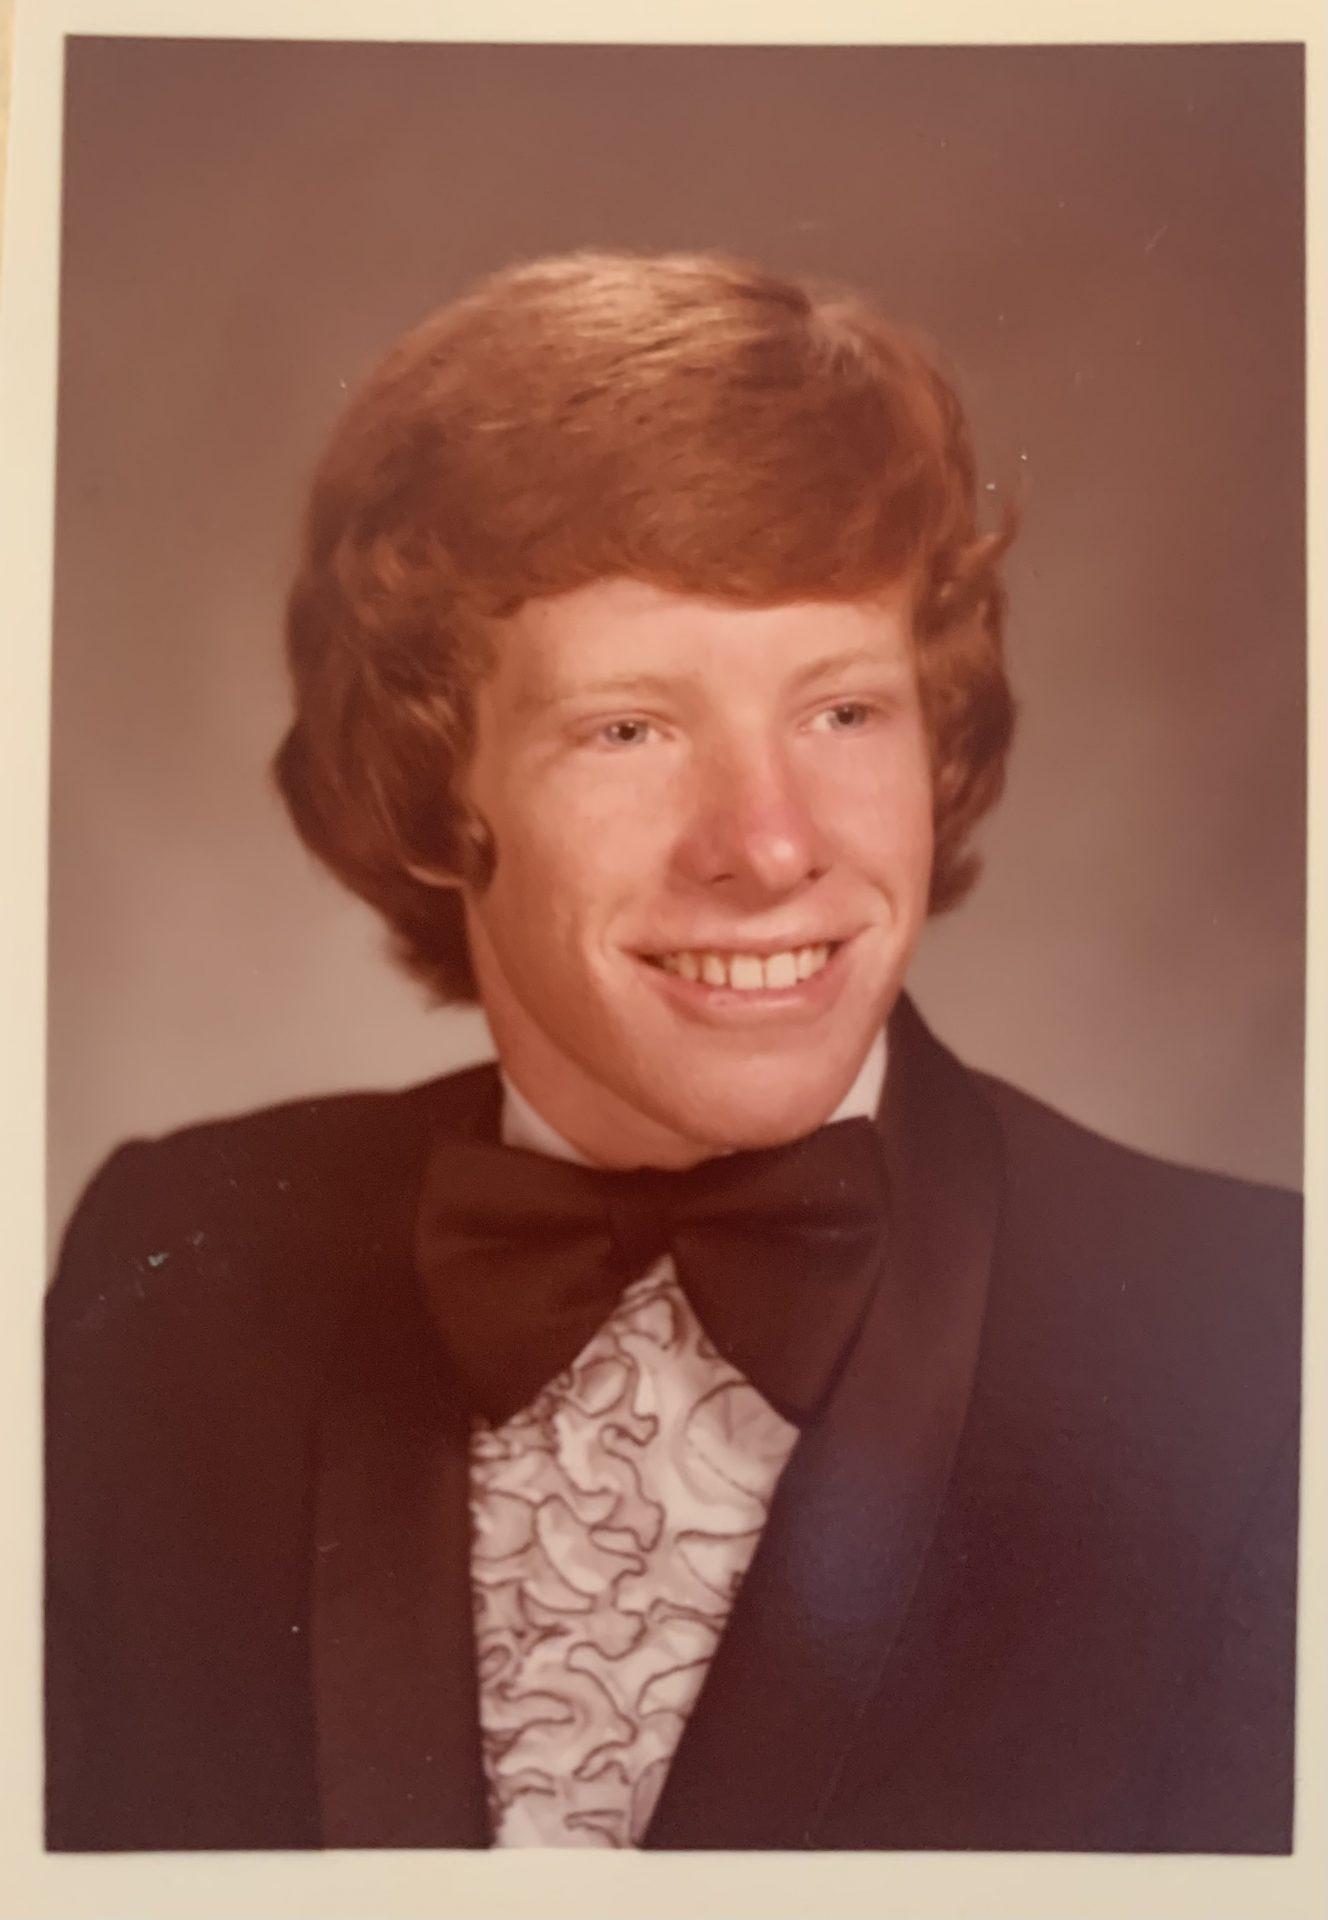 Richard's Senior High Photo